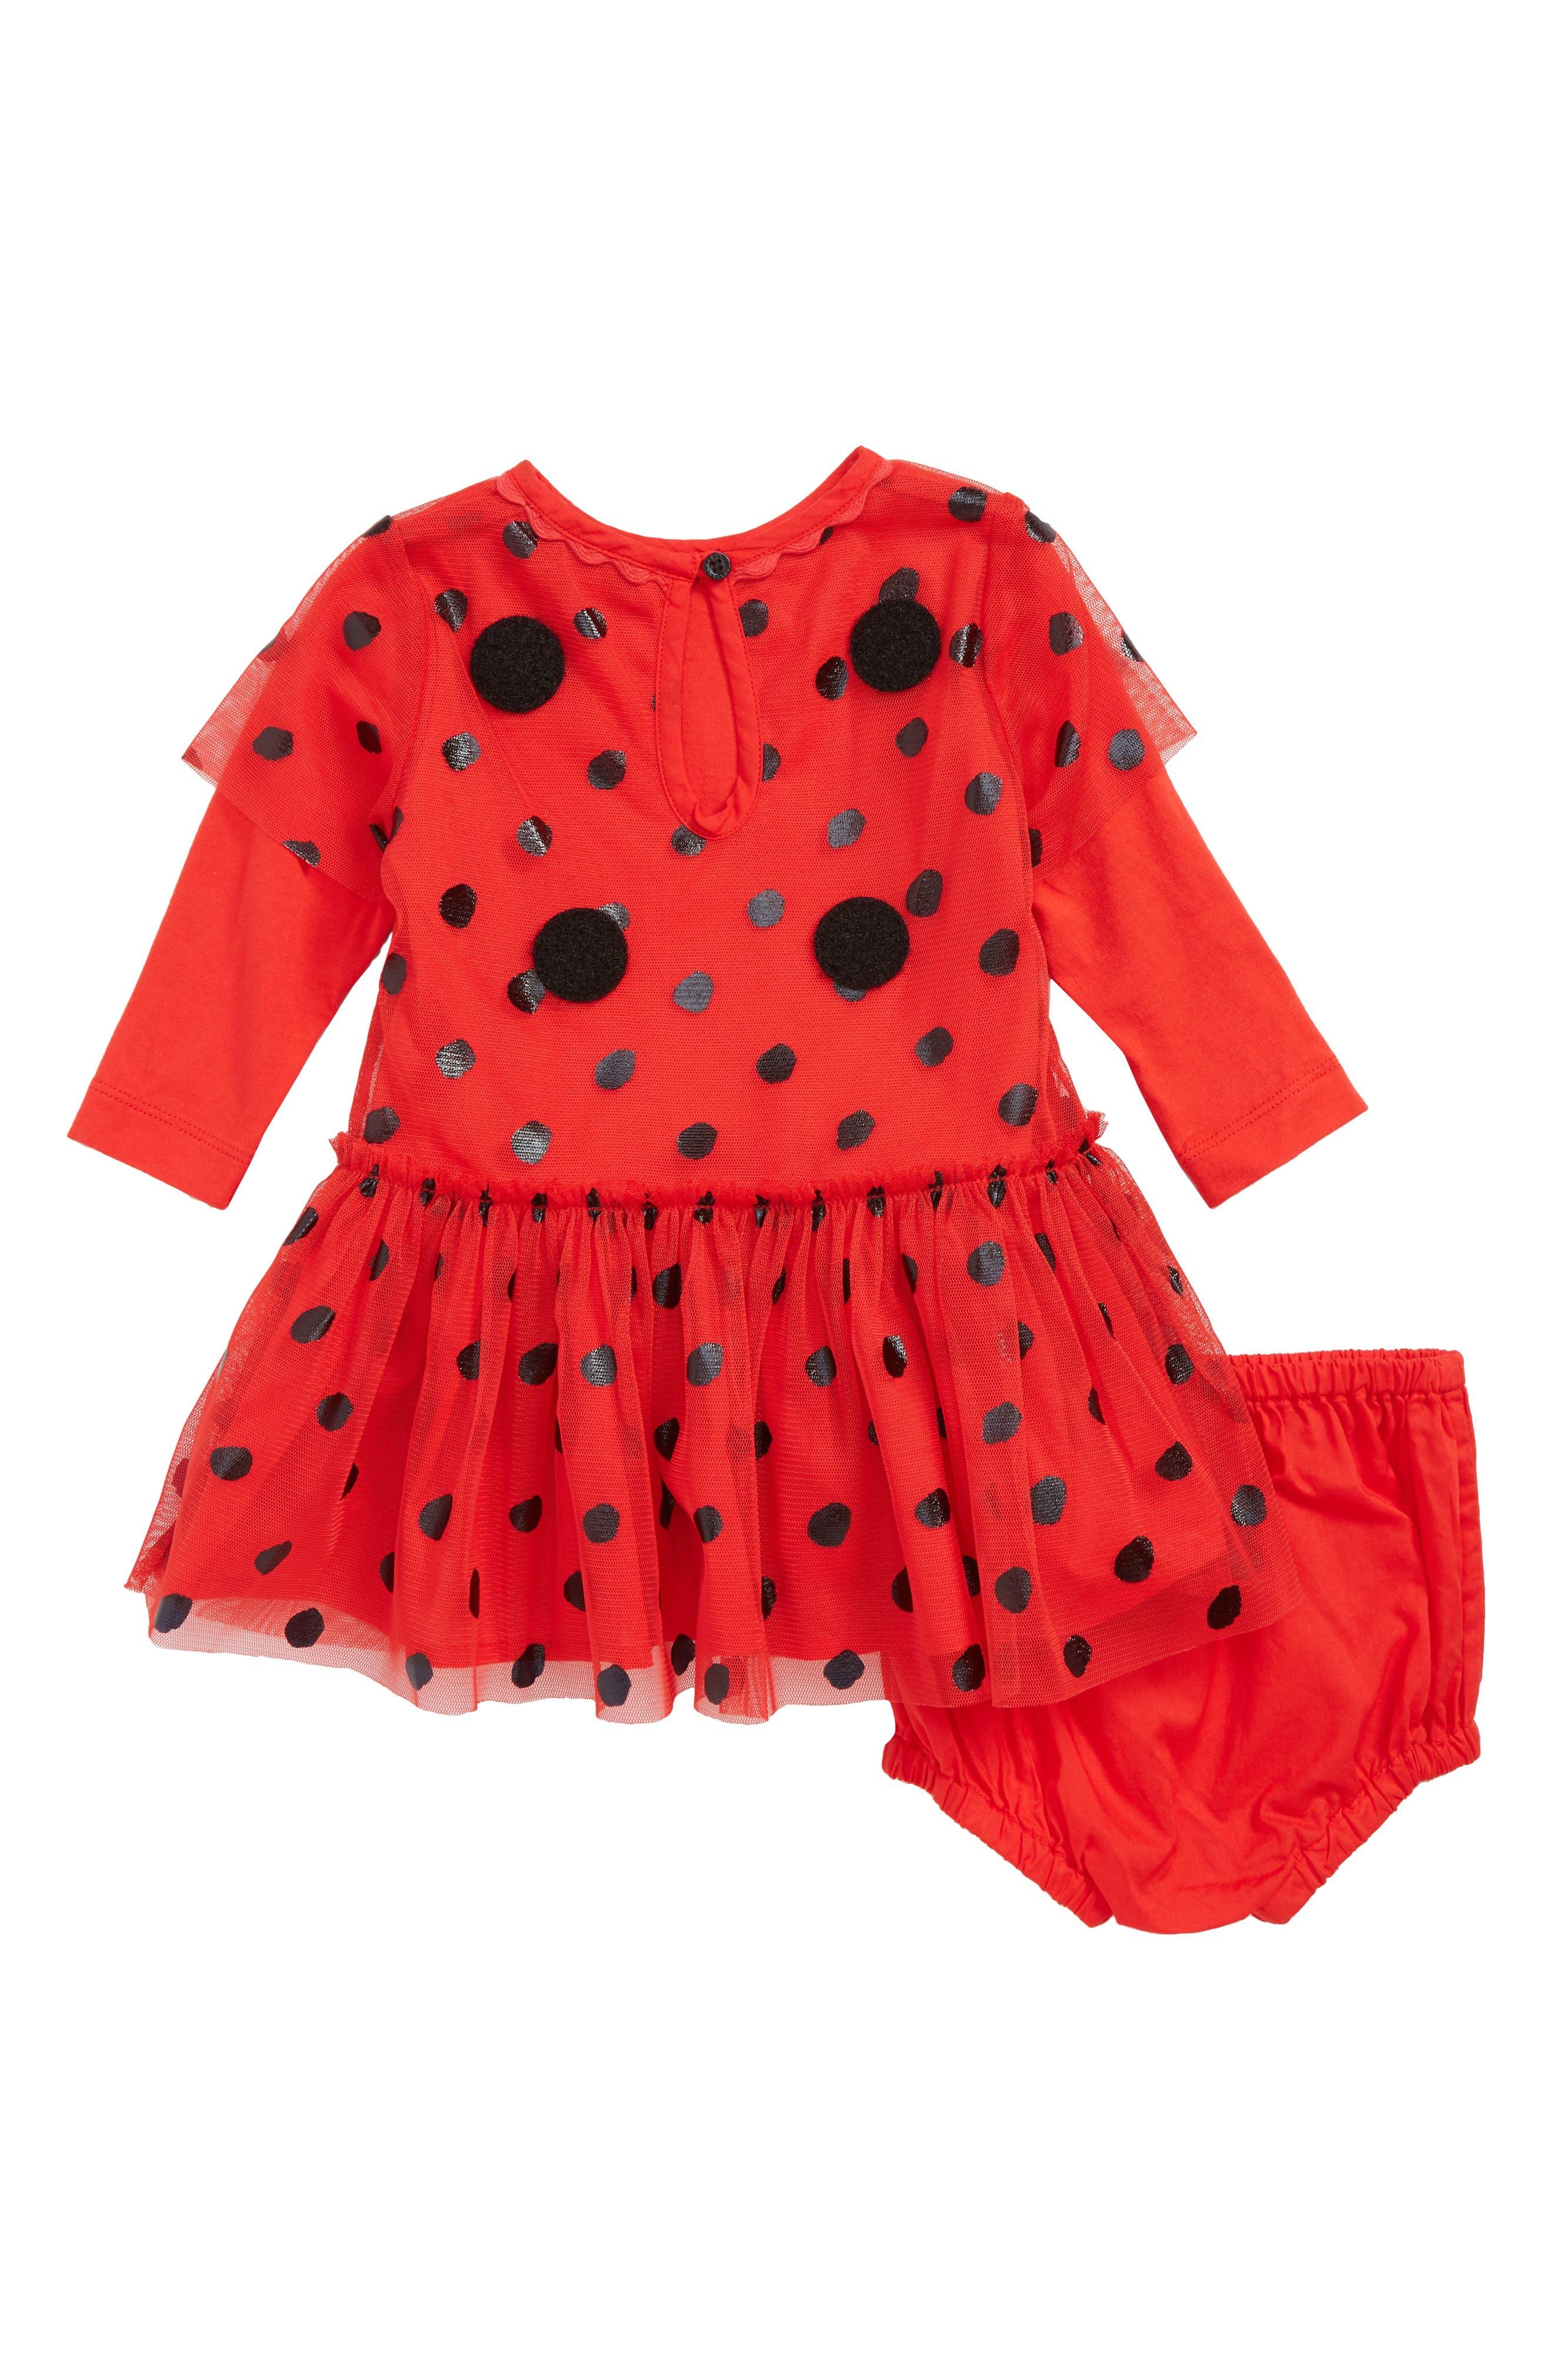 Mouse Dress & Wings Set,                             Alternate thumbnail 3, color,                             Red Black